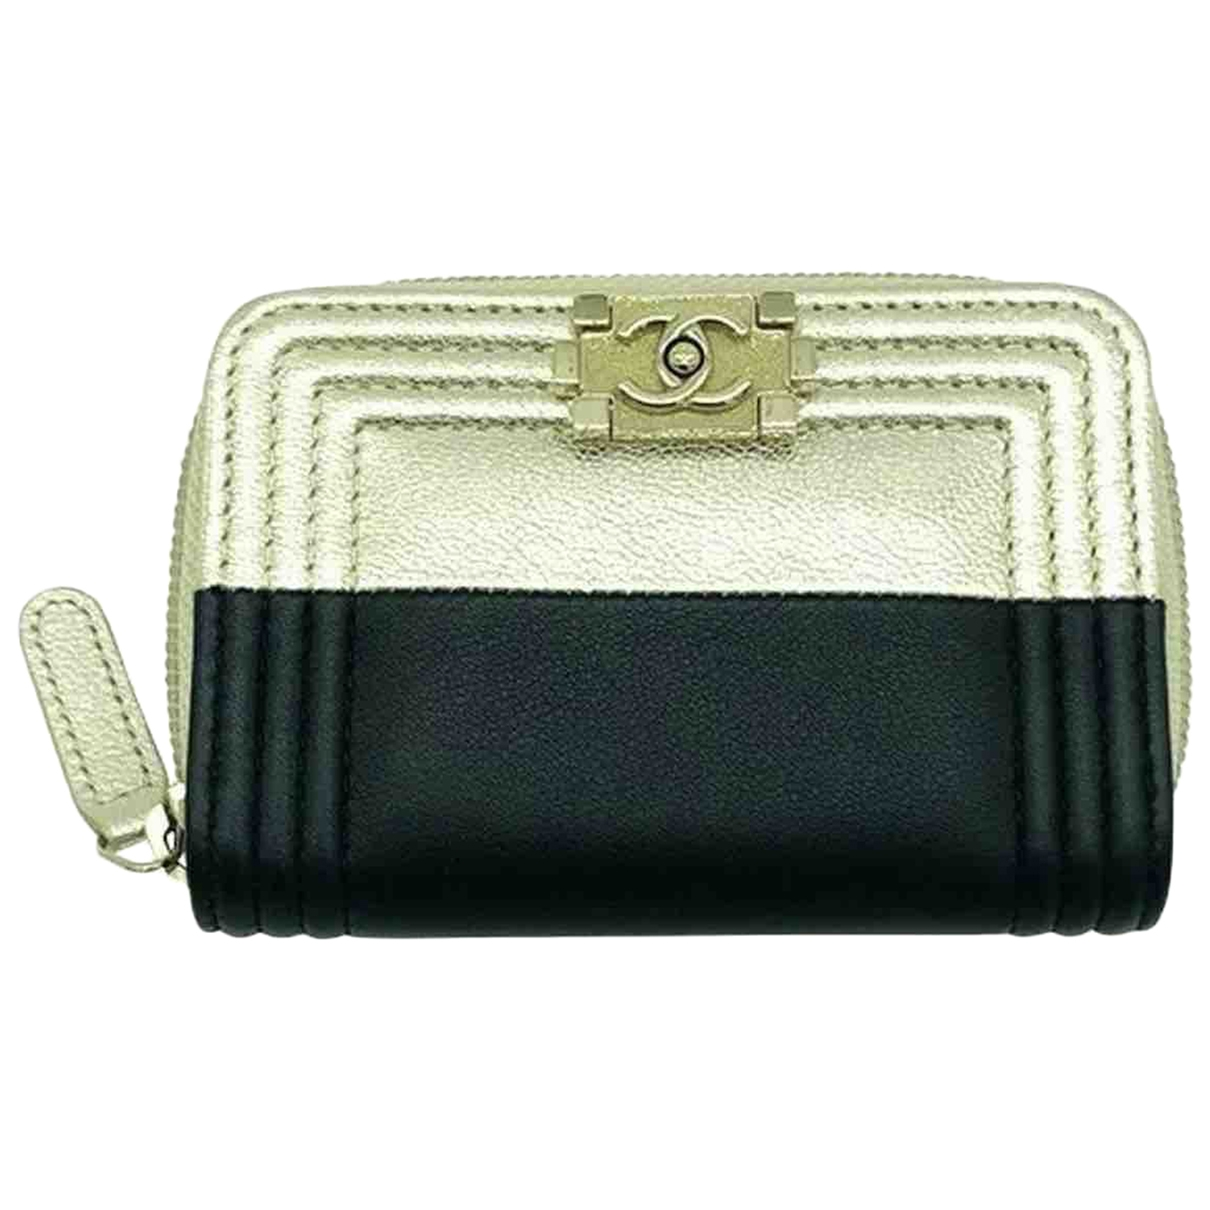 Chanel Boy Black Leather Purses, wallet & cases for Women \N